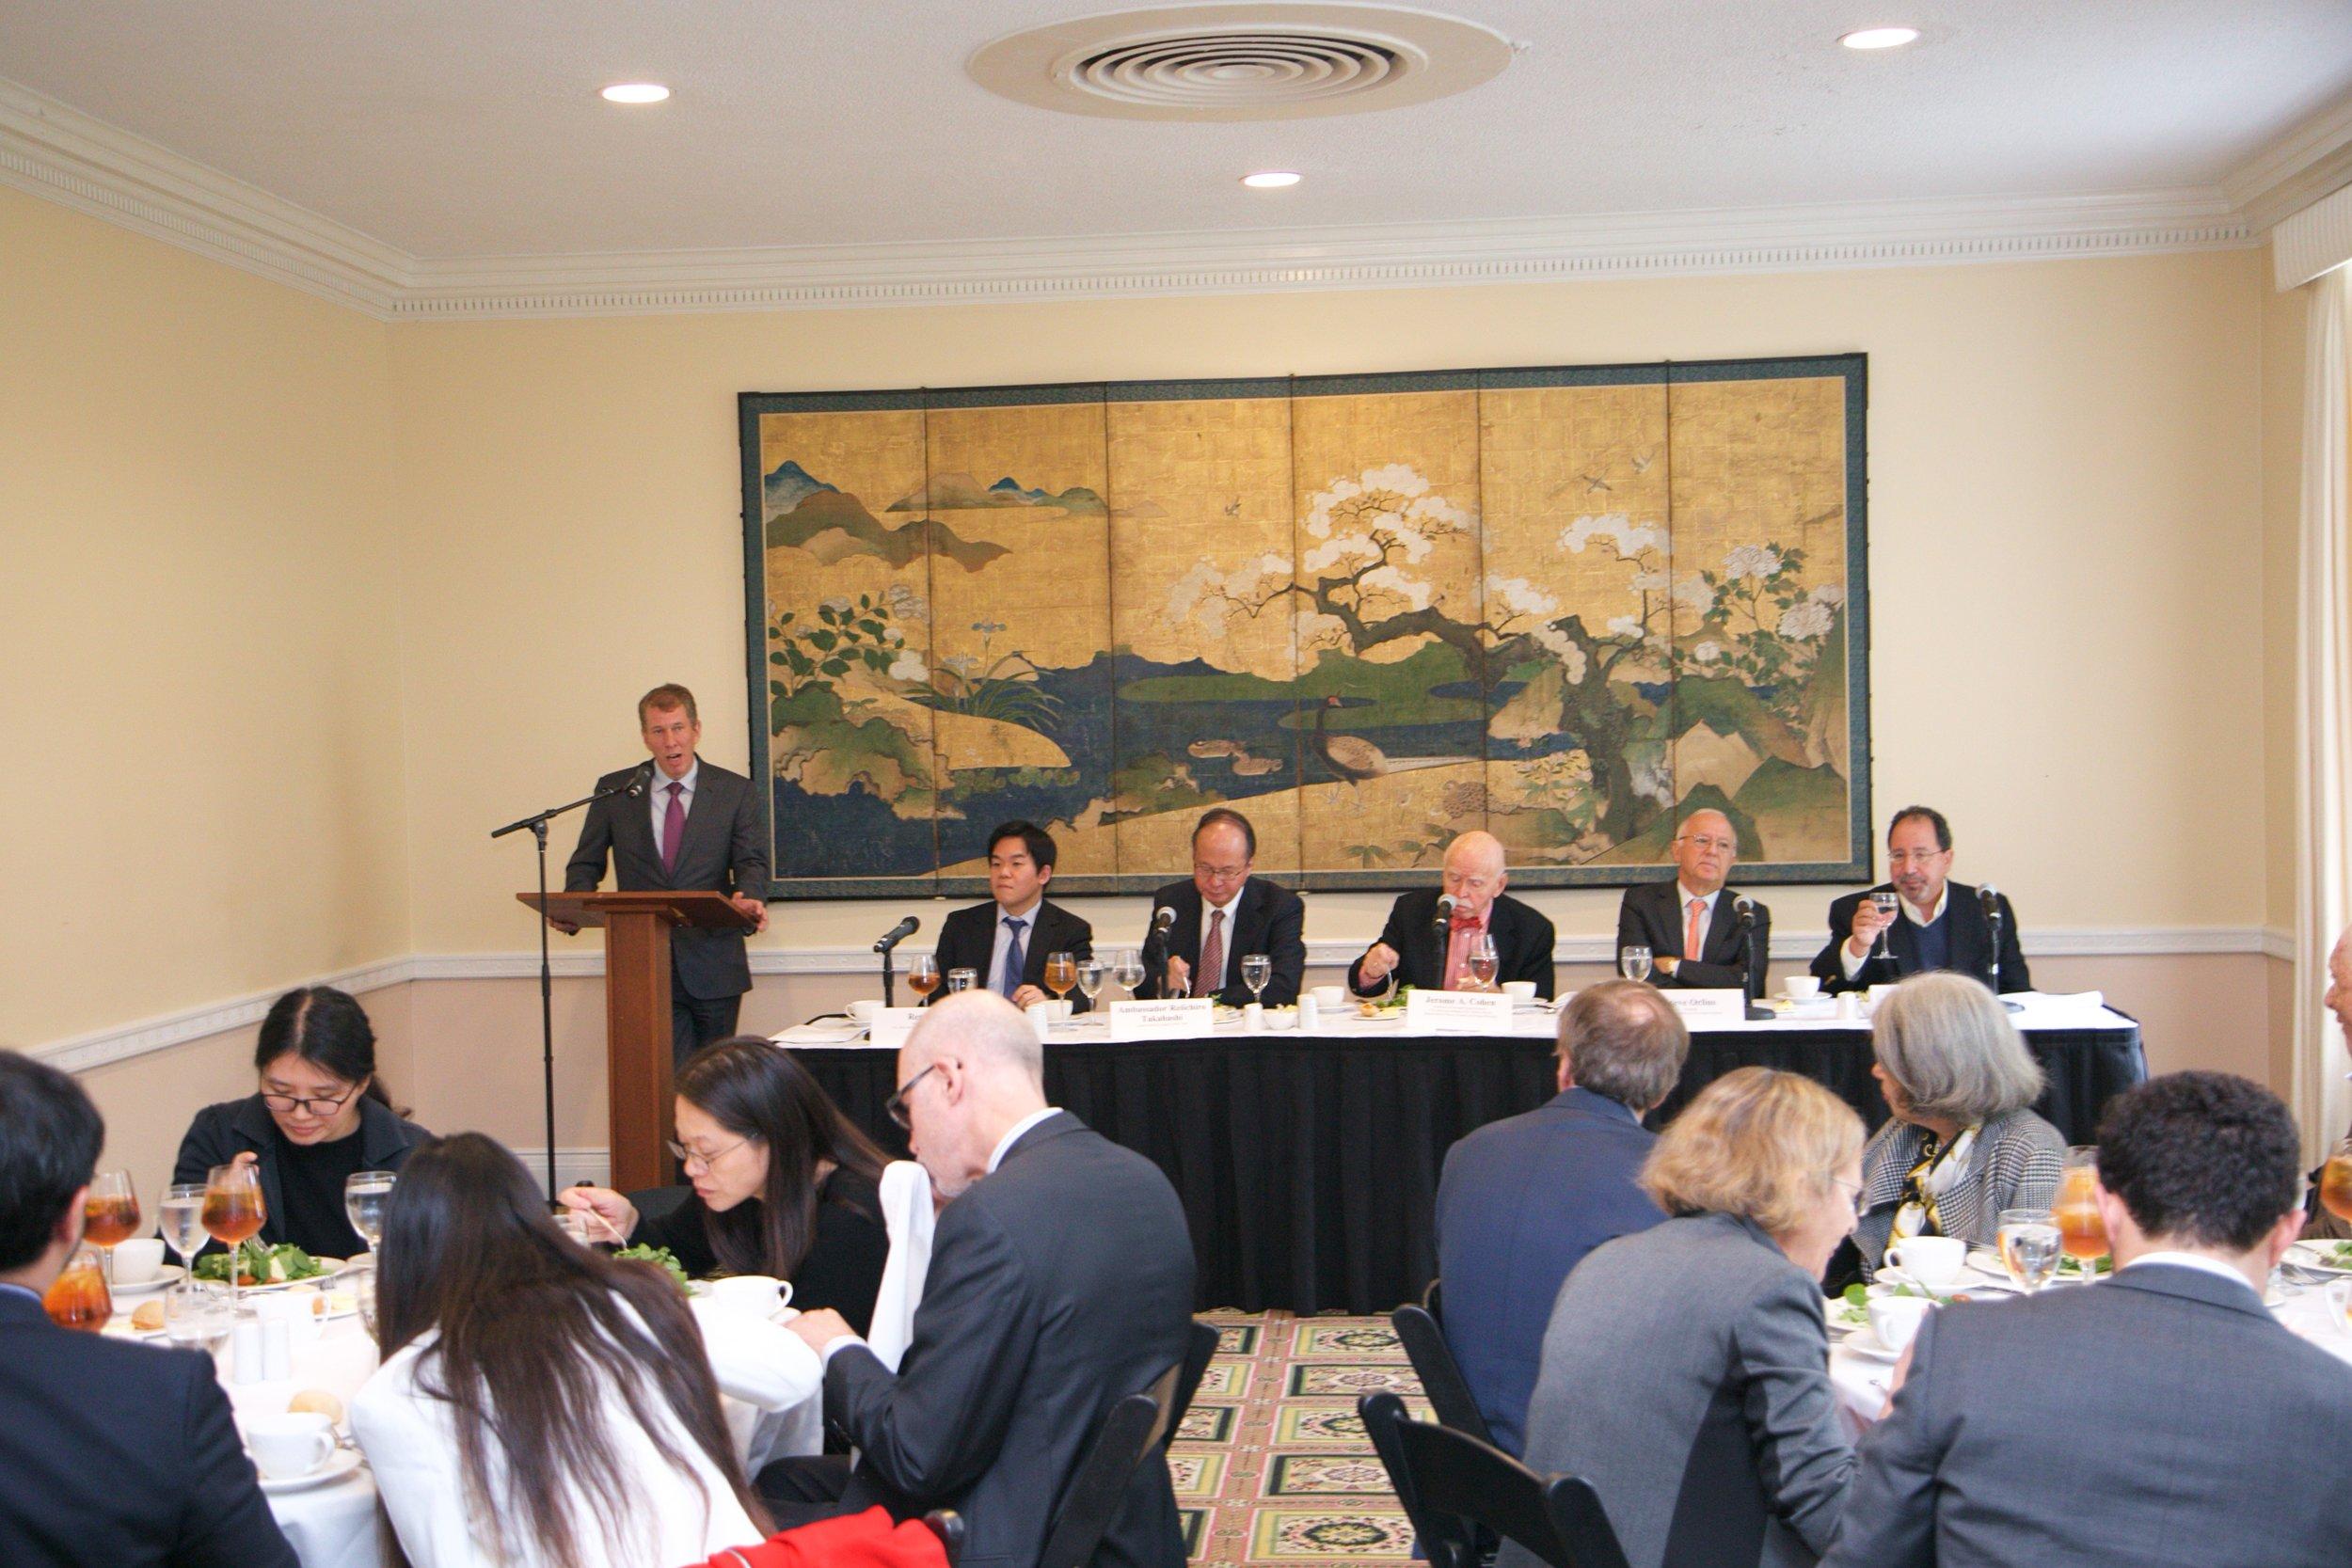 Remarks by NYU Law School Dean Morrison